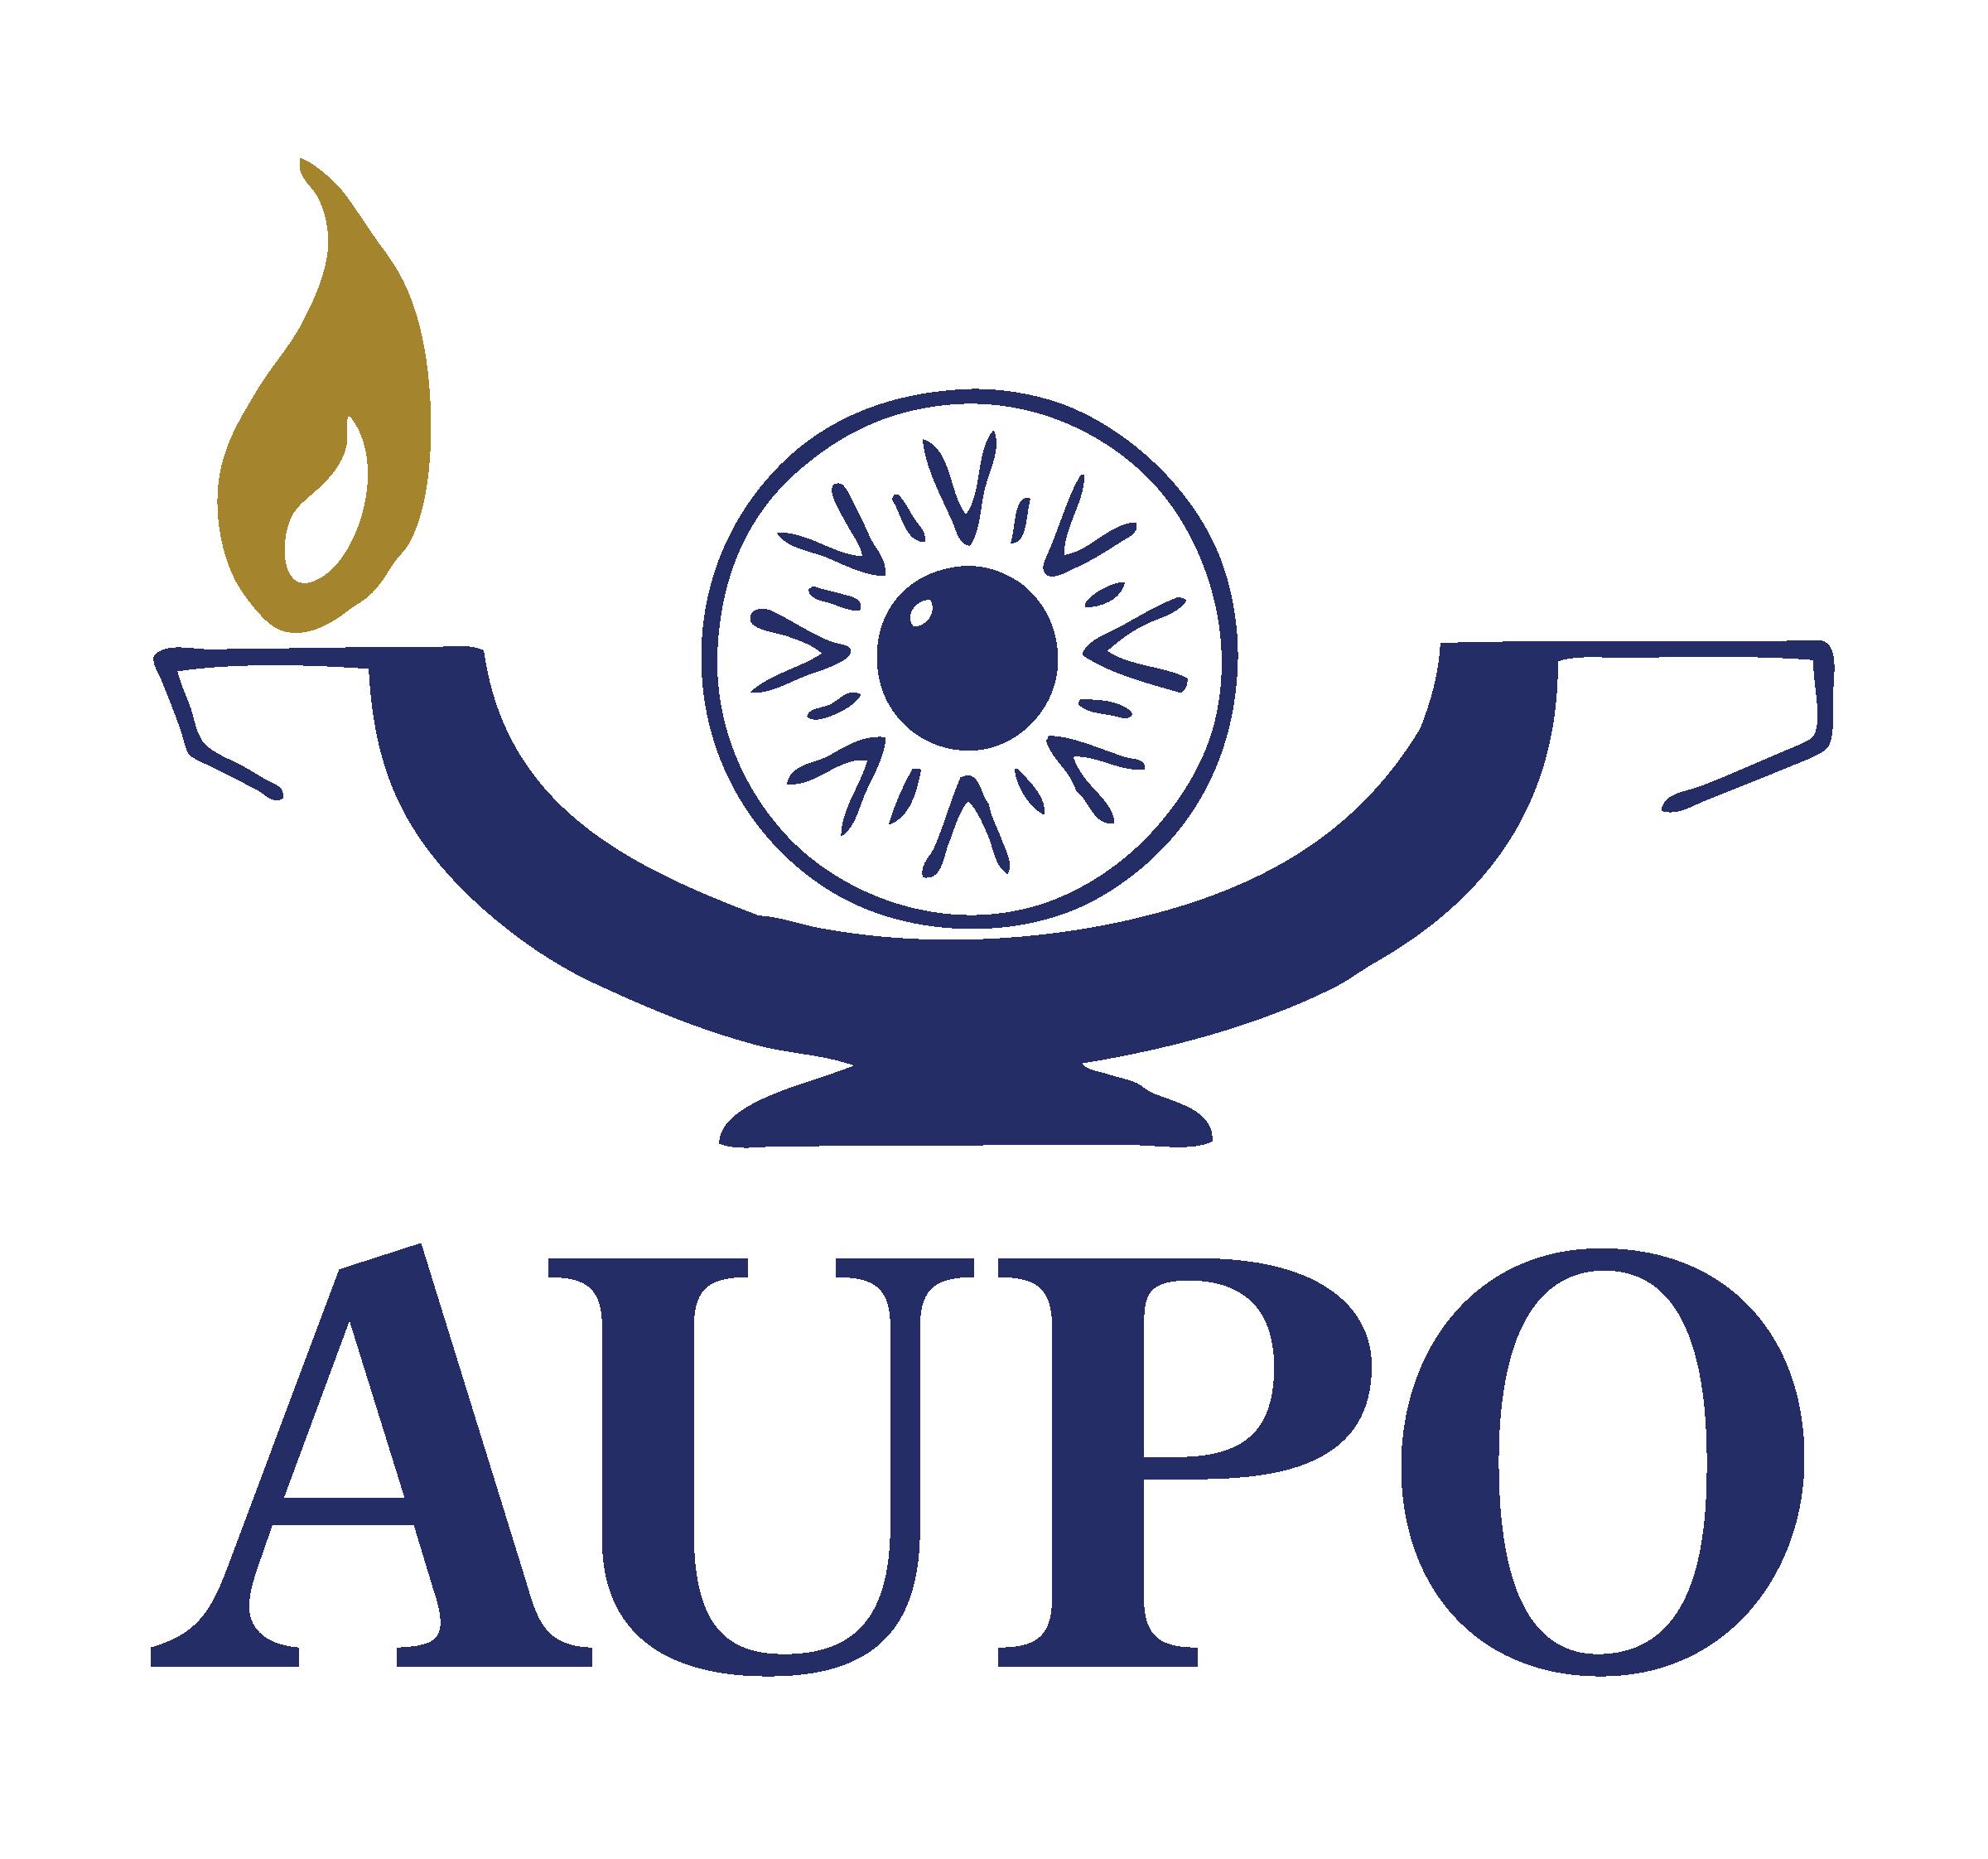 AUPO_Acronym_WEB232c65_2400w.png